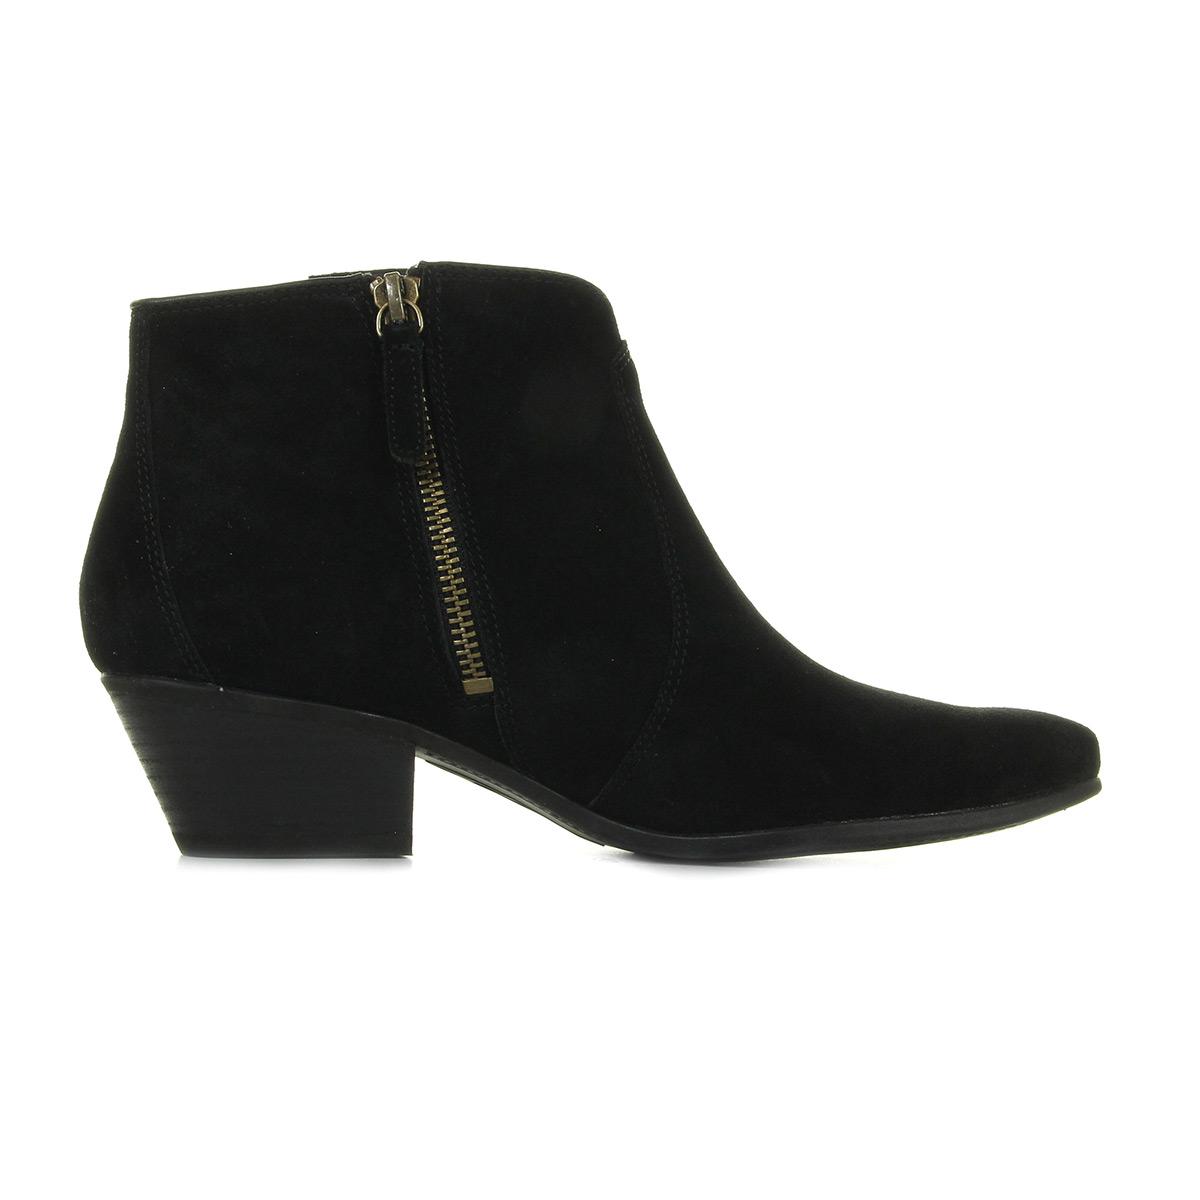 Timberland Tassle Boot Black Suede CA1K6Z, Bottines femme